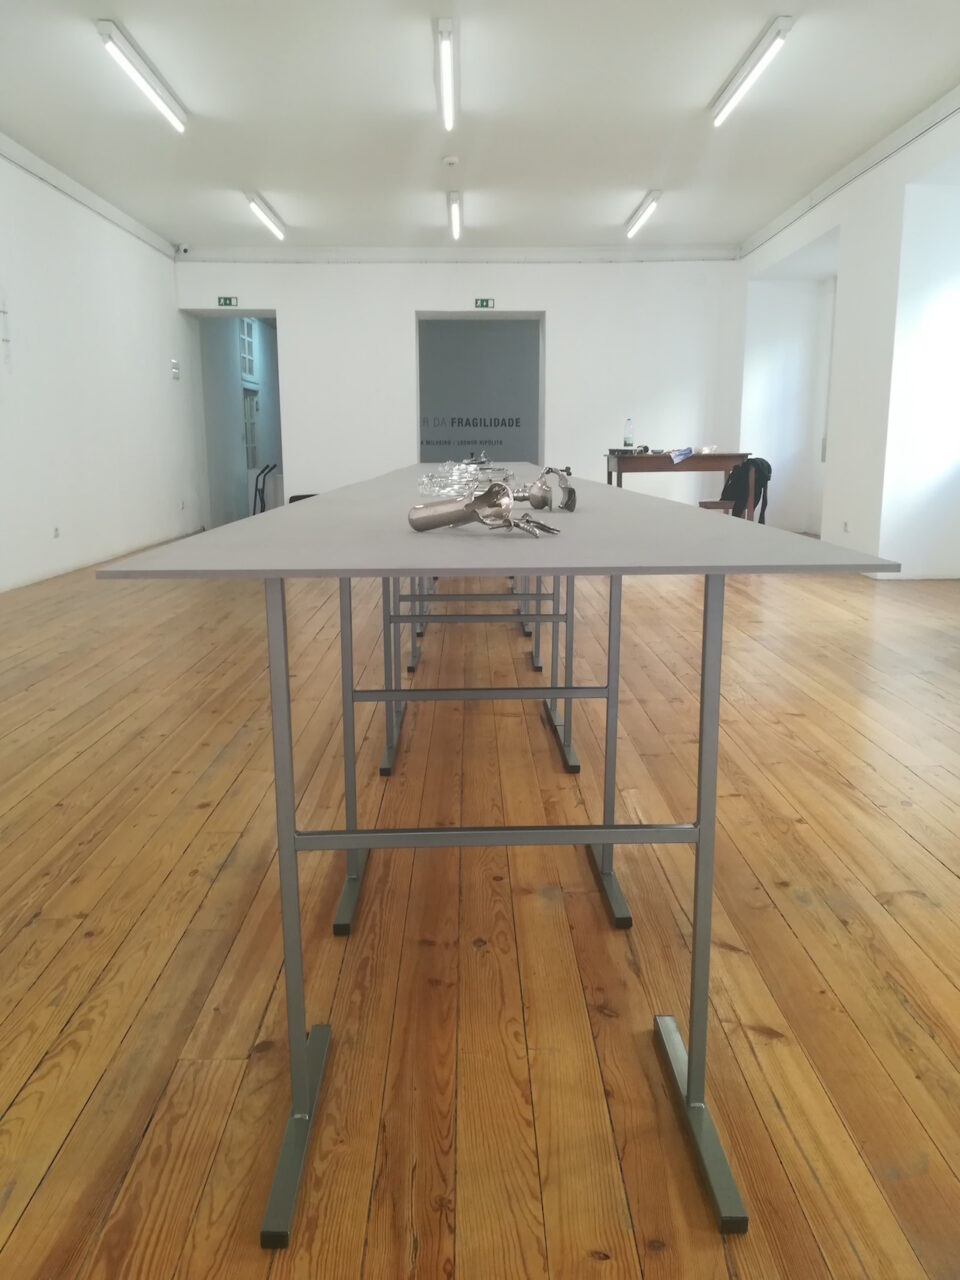 Teresa Milheiro, The Power of Fragility, 2019, verchroomd messing, glas, staal, tentoonstelling